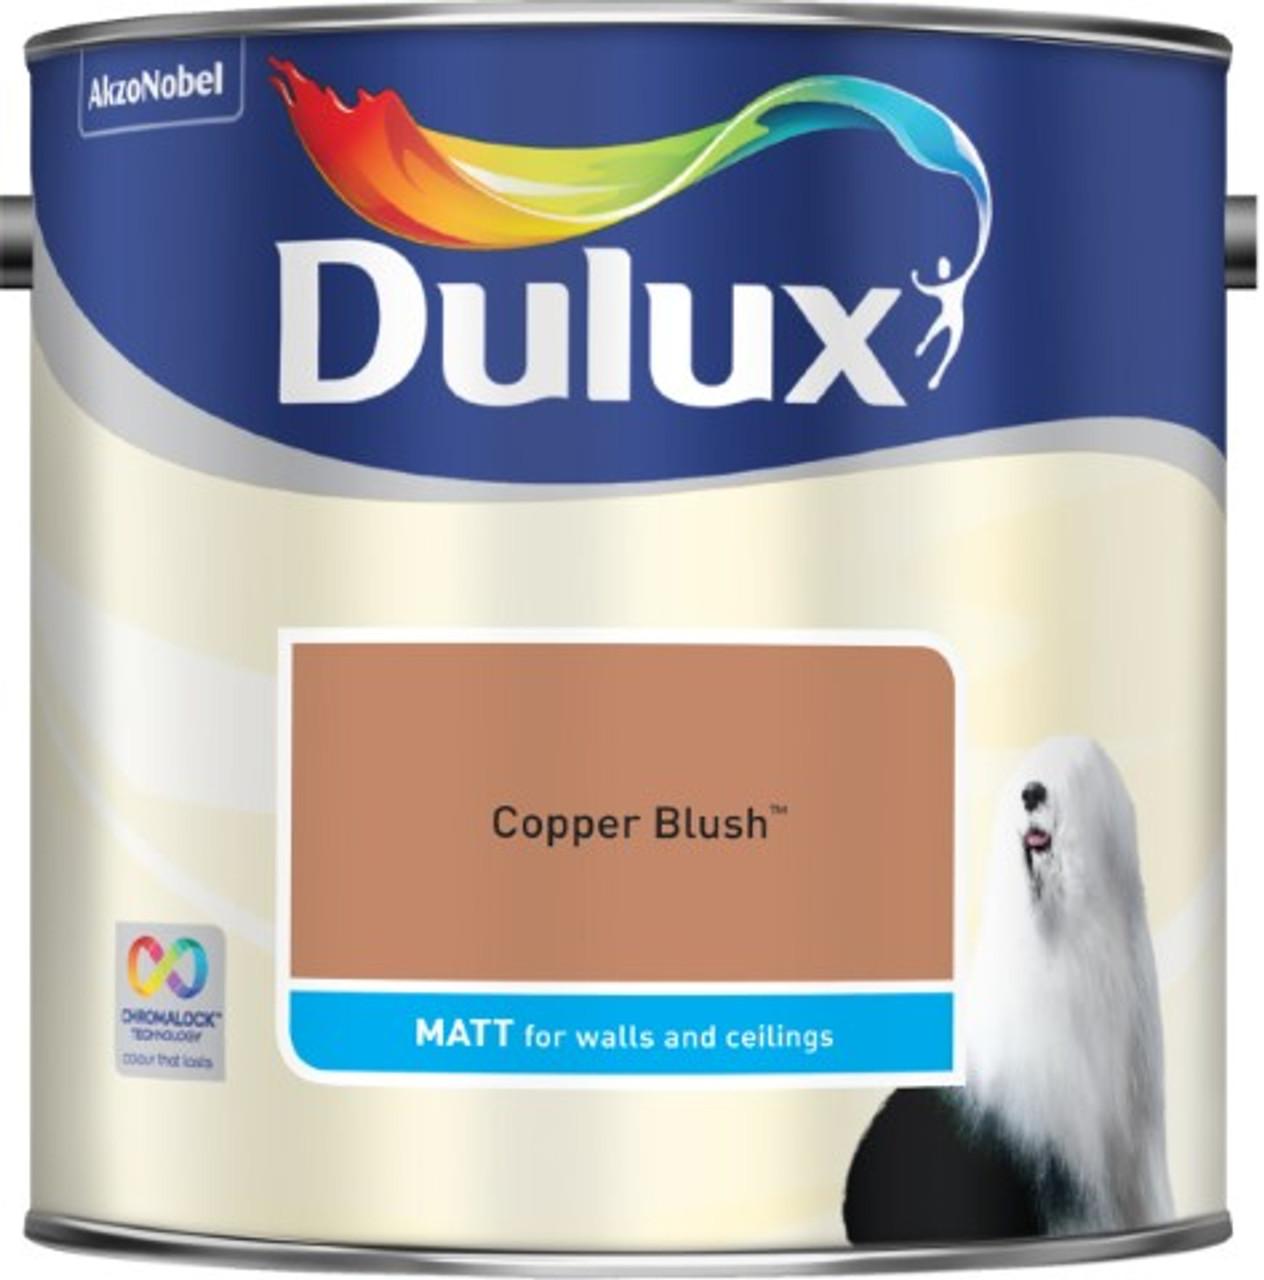 2.5L Dulux Matt Emulsion Copper Blush